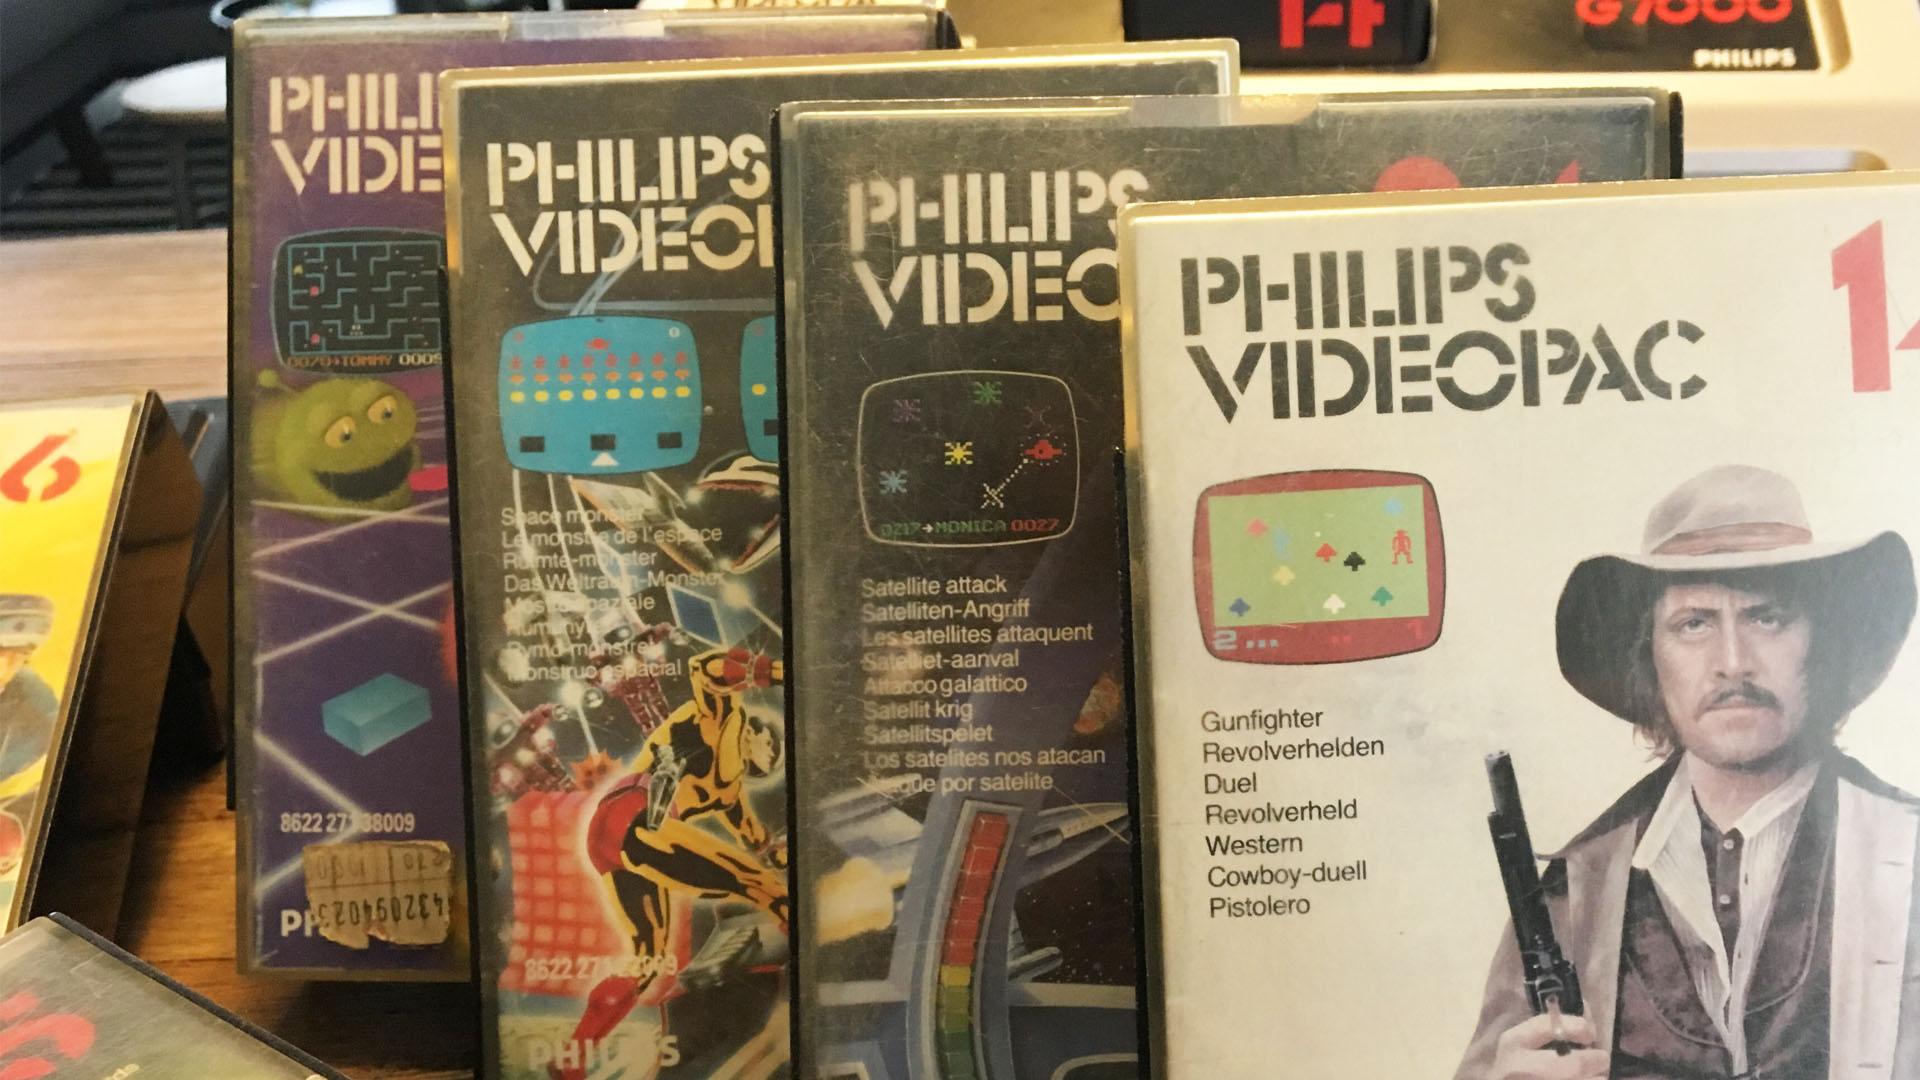 Videopac G7000 games